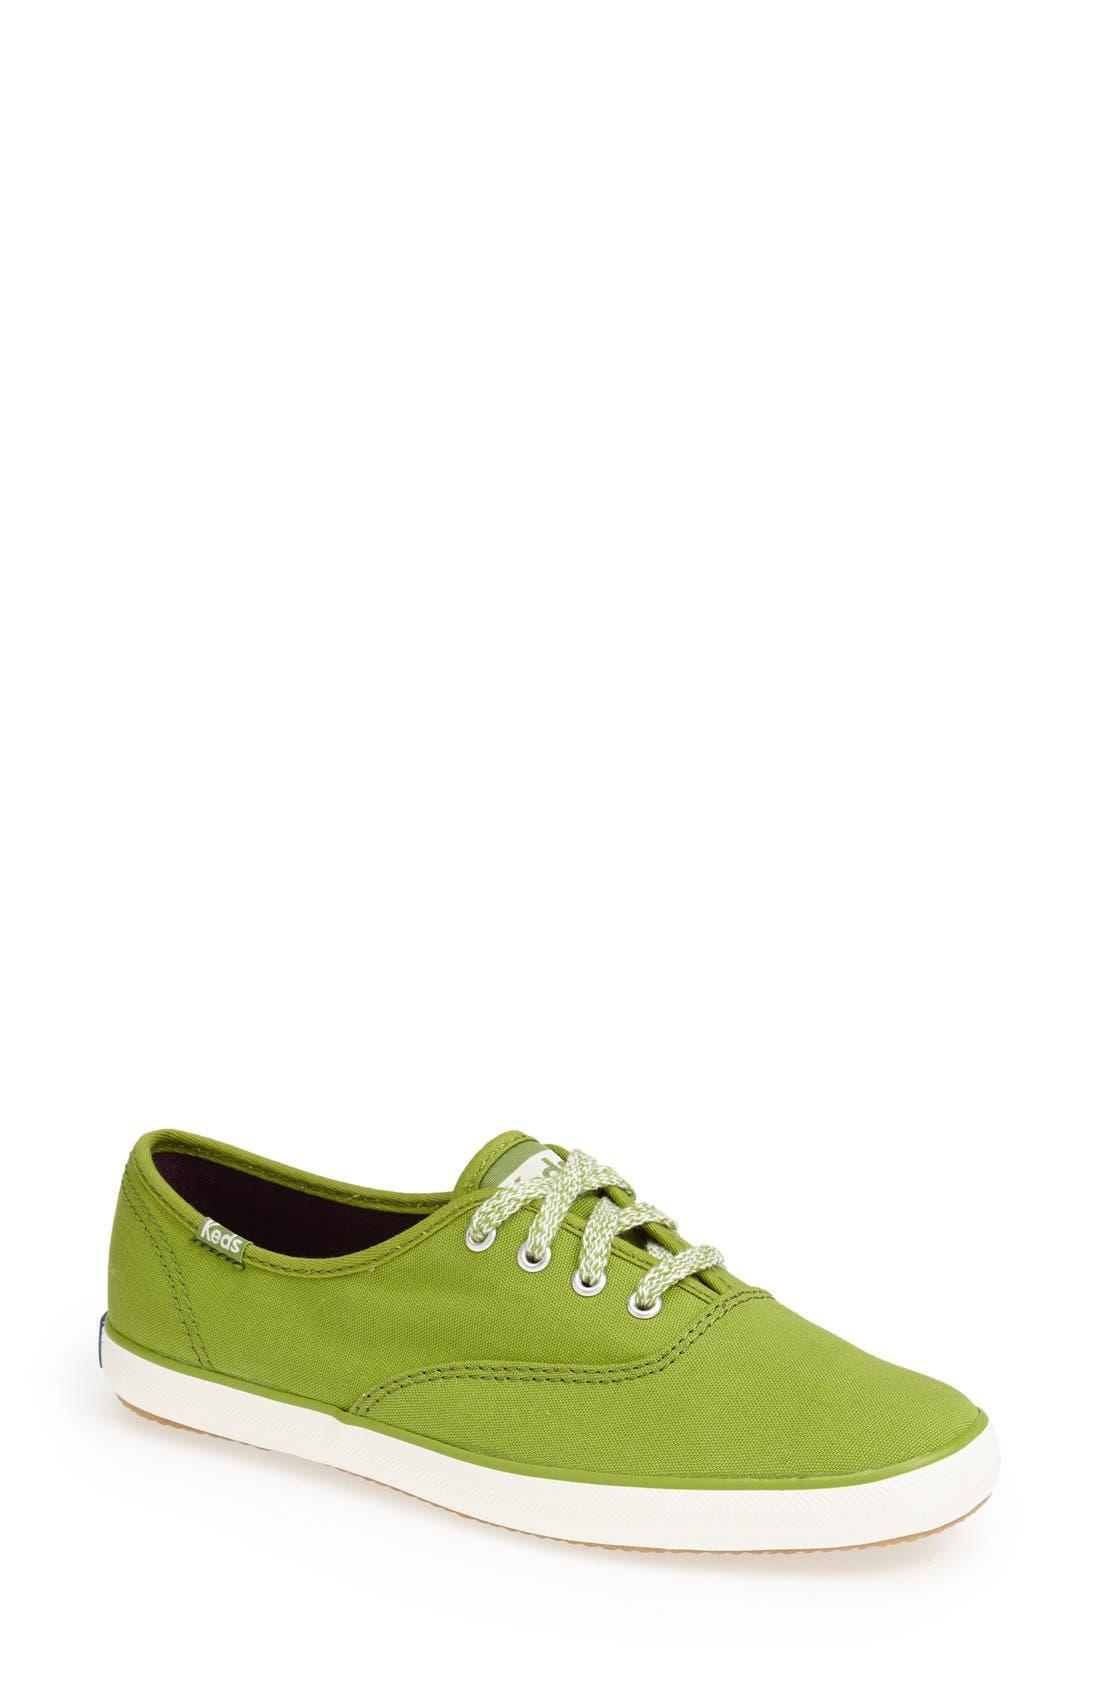 Main Image - Keds® 'Champion' Canvas Sneaker (Women)